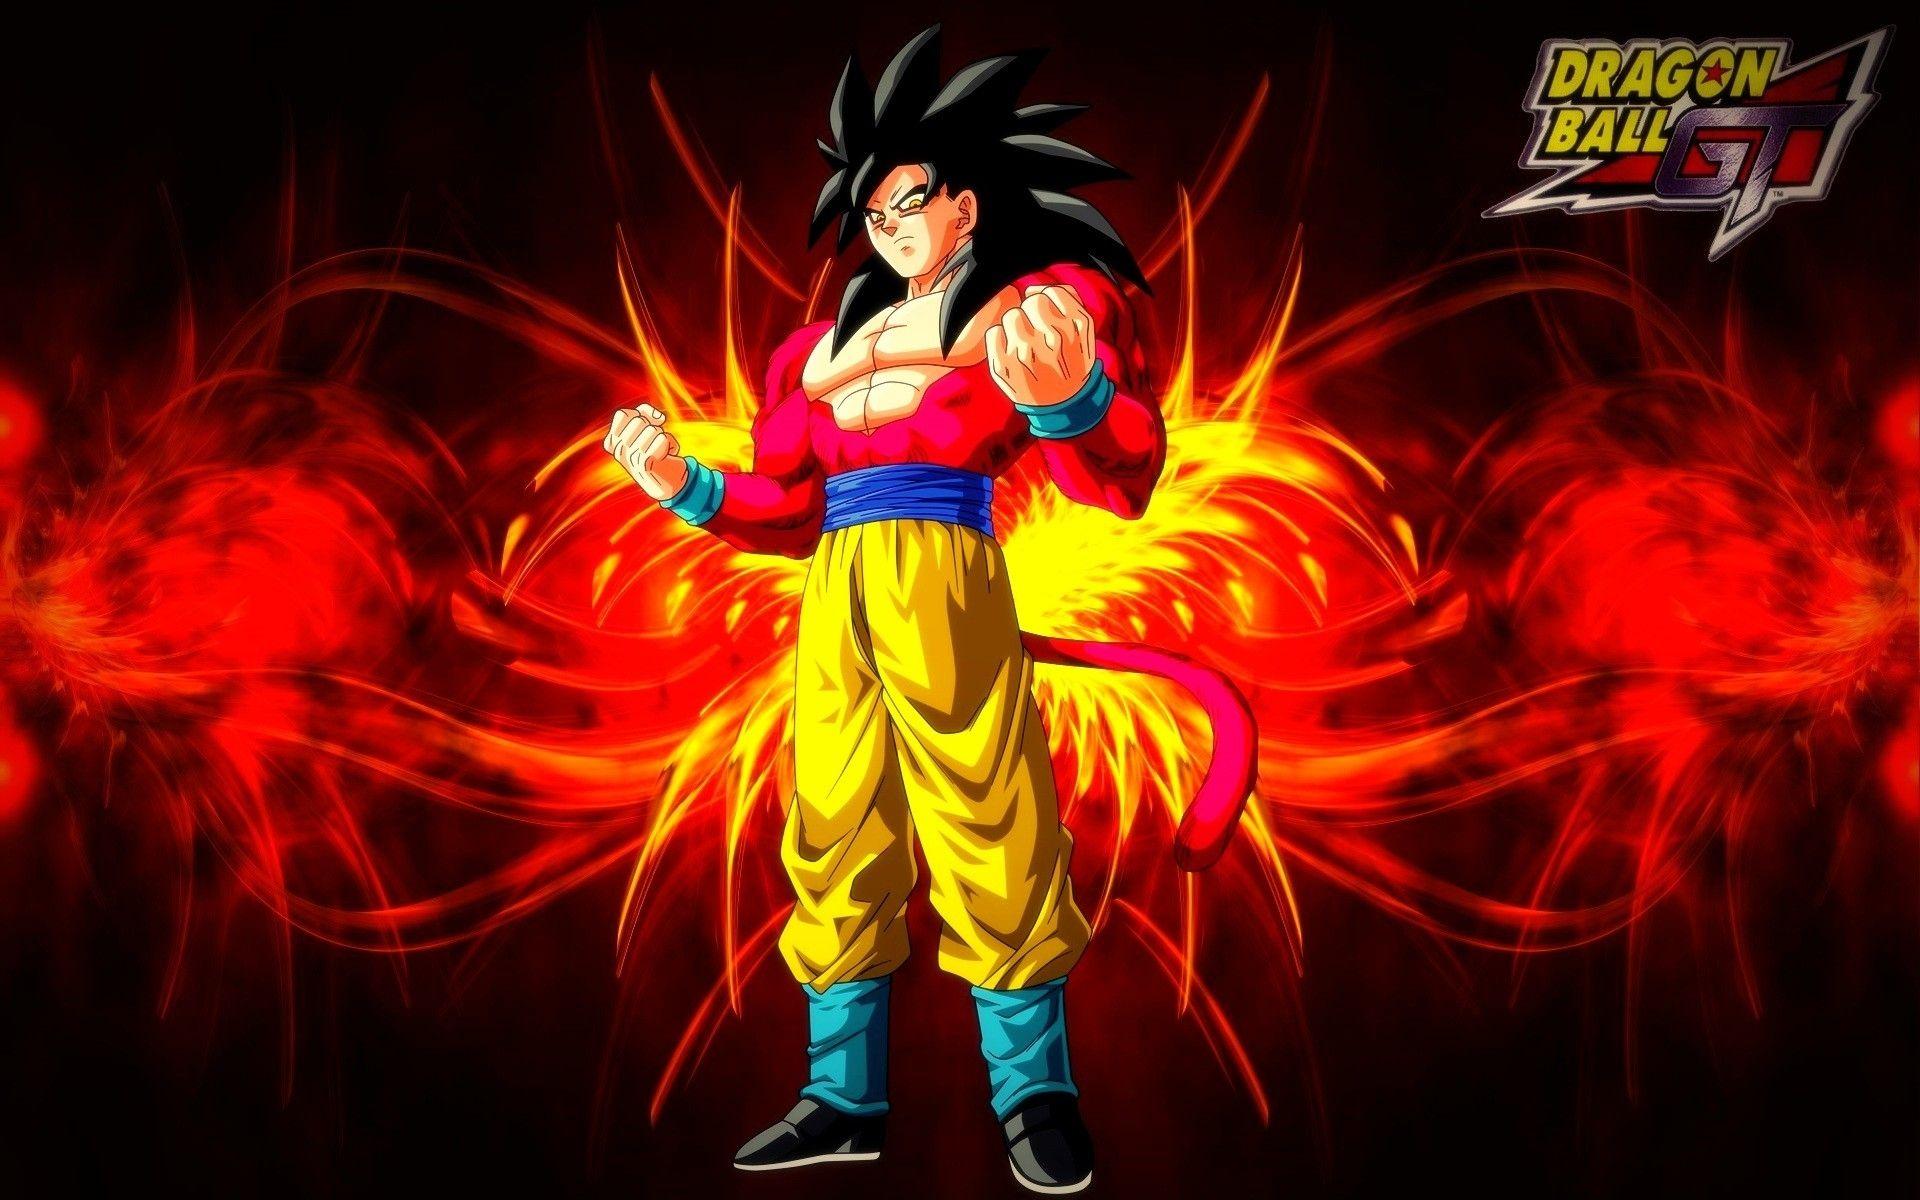 10 Best Super Saiyan 4 Goku Wallpaper Full Hd 19201080 For Pc